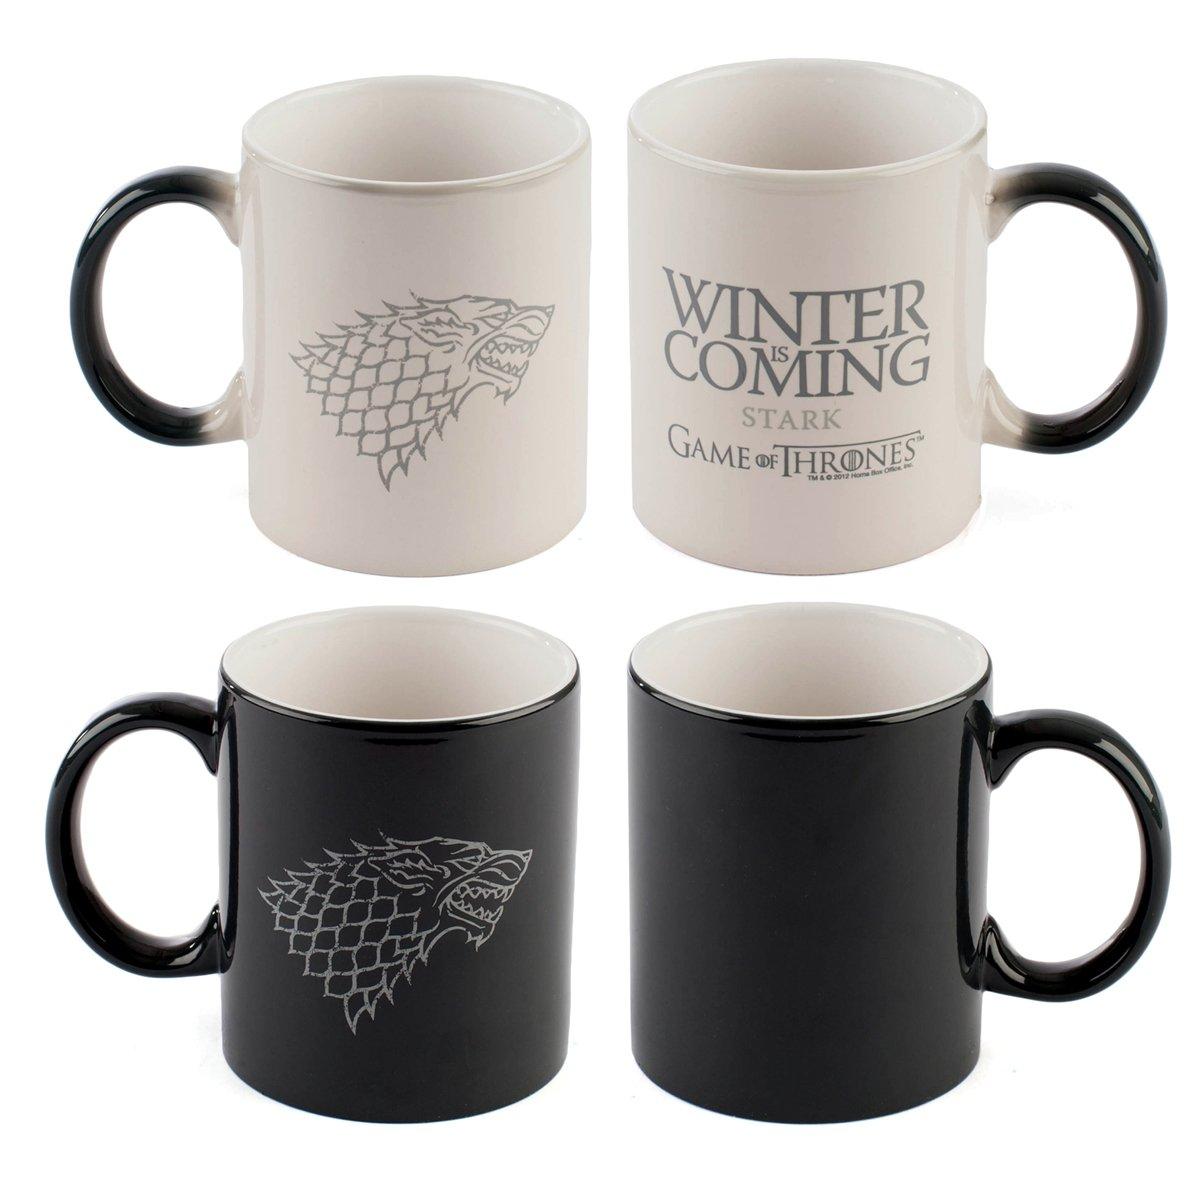 Game of Thrones Winter Is Coming Heat Sensitive Mug